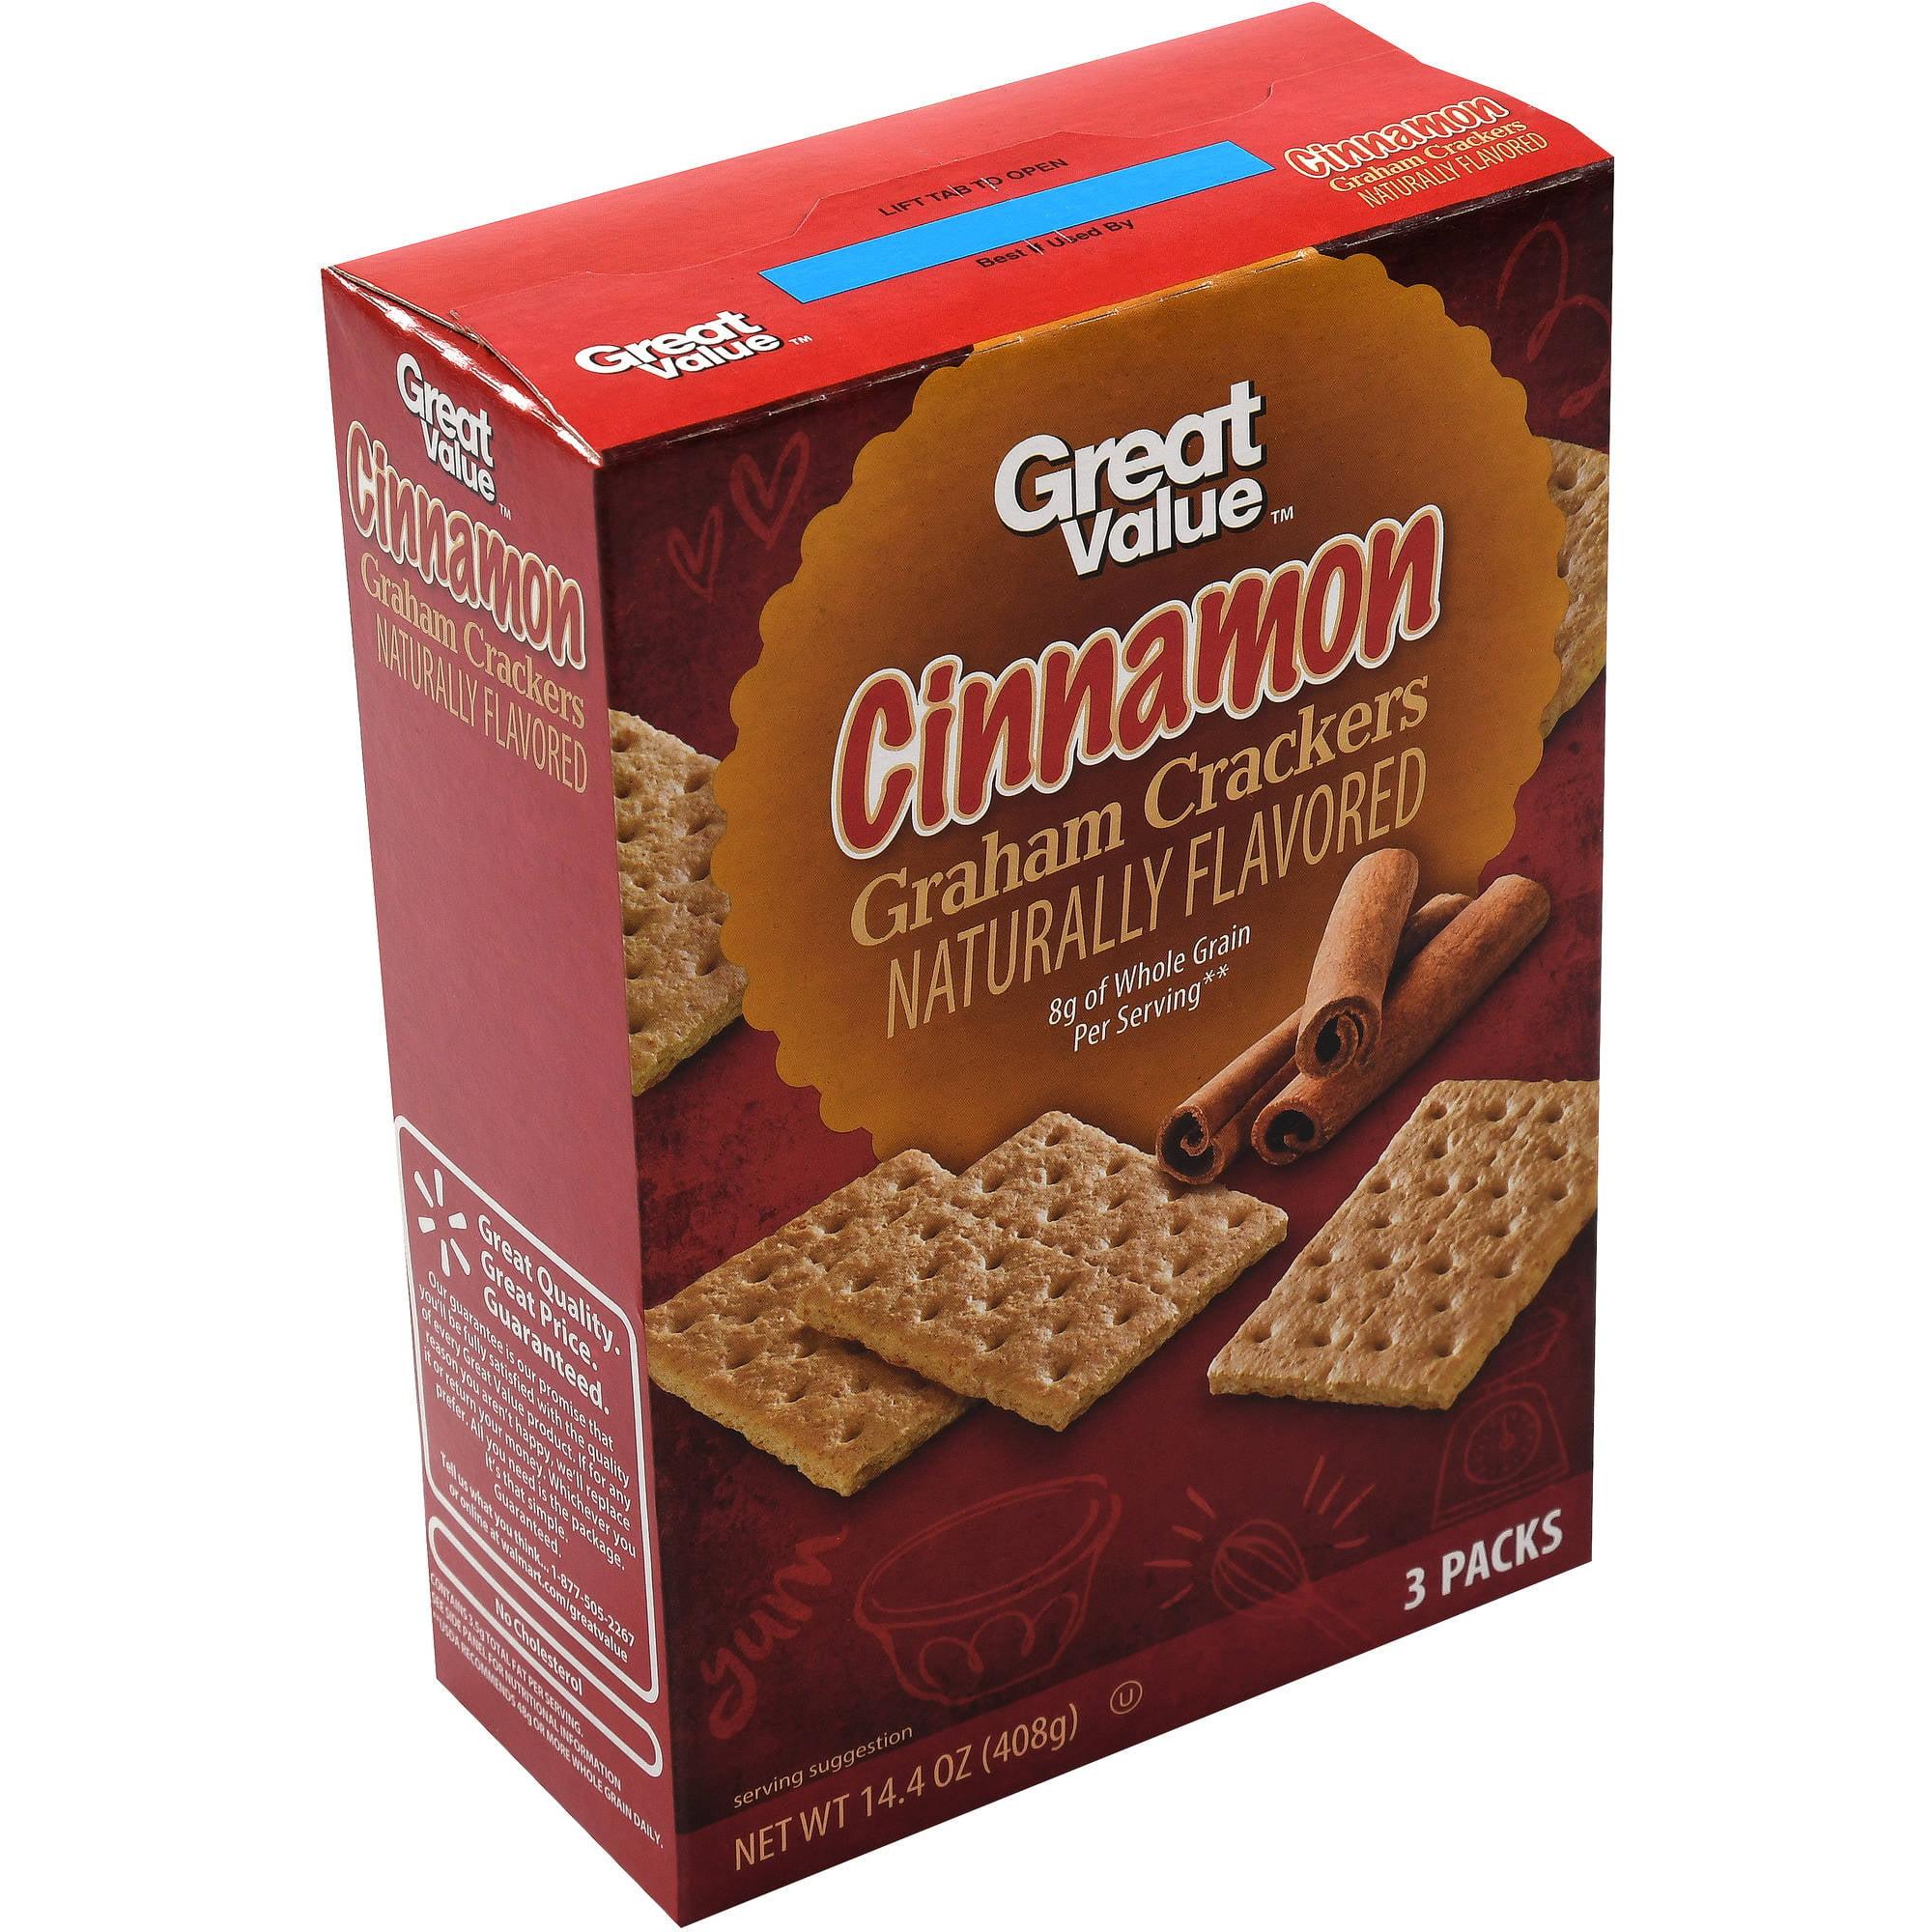 Great Value: Cinnamon Grahams Crackers 3 Packs, 14.4 Oz